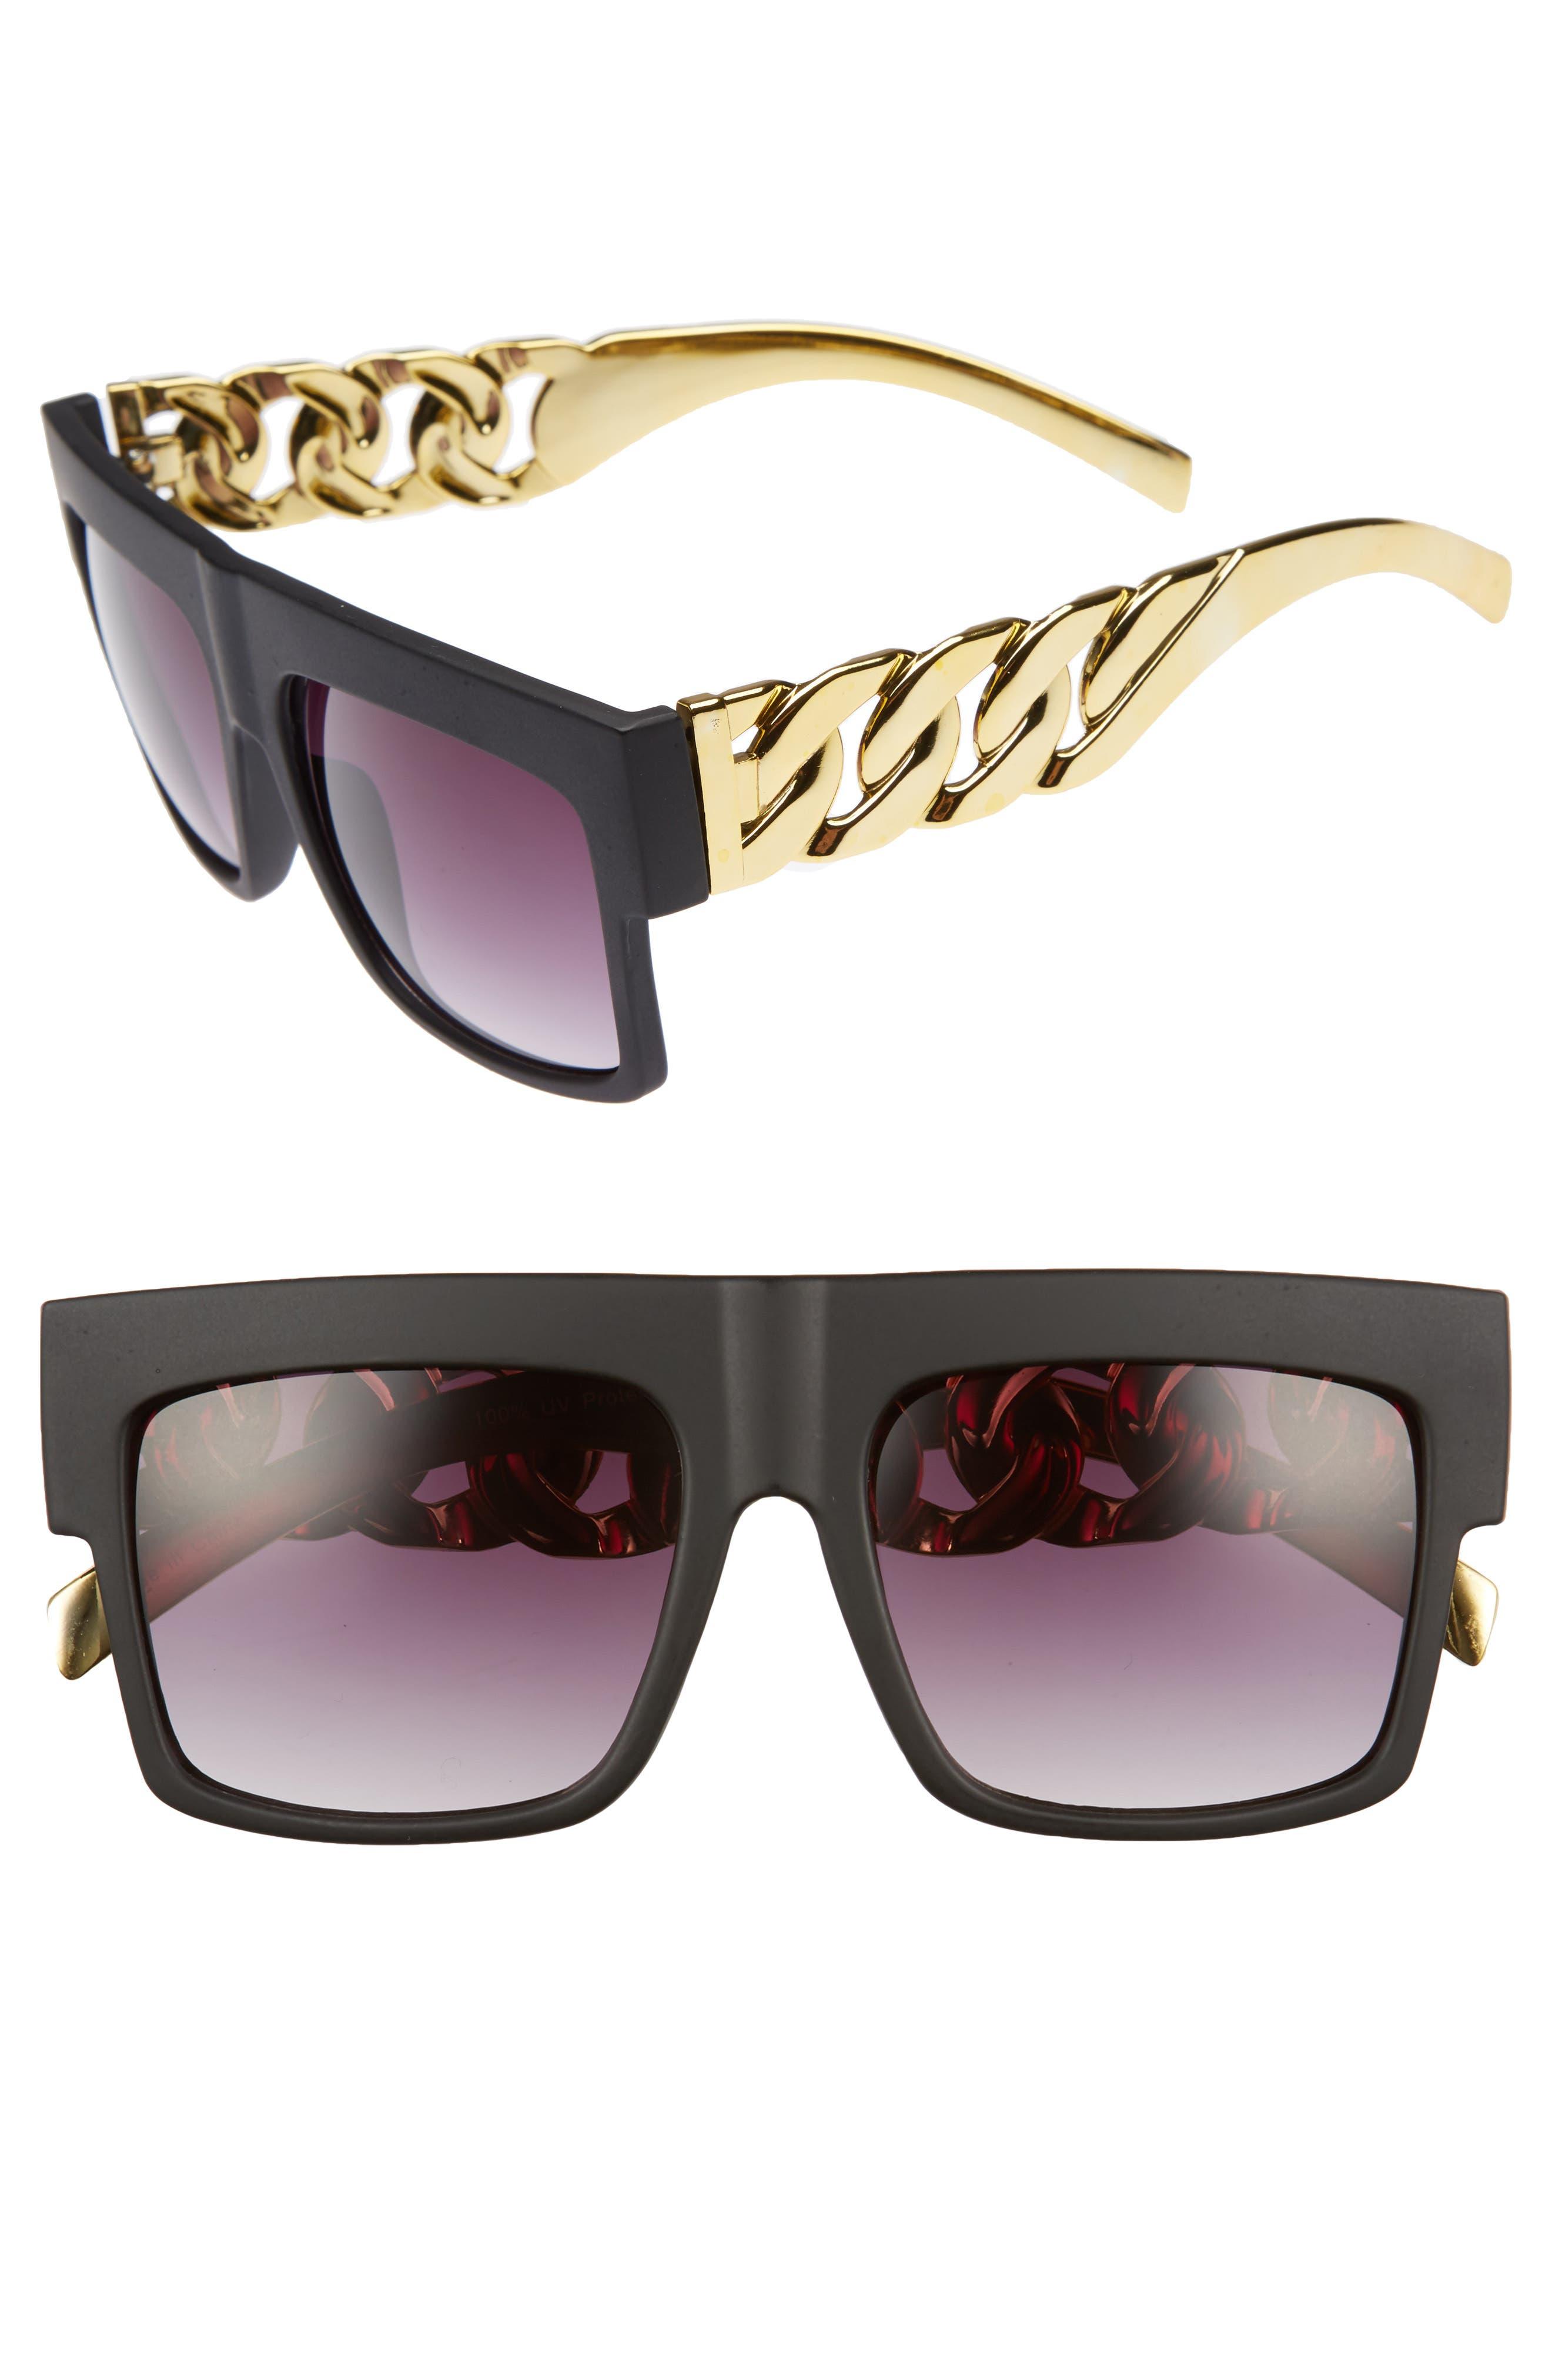 52mm Chain Detail Shield Sunglasses,                         Main,                         color, Black/ Gold